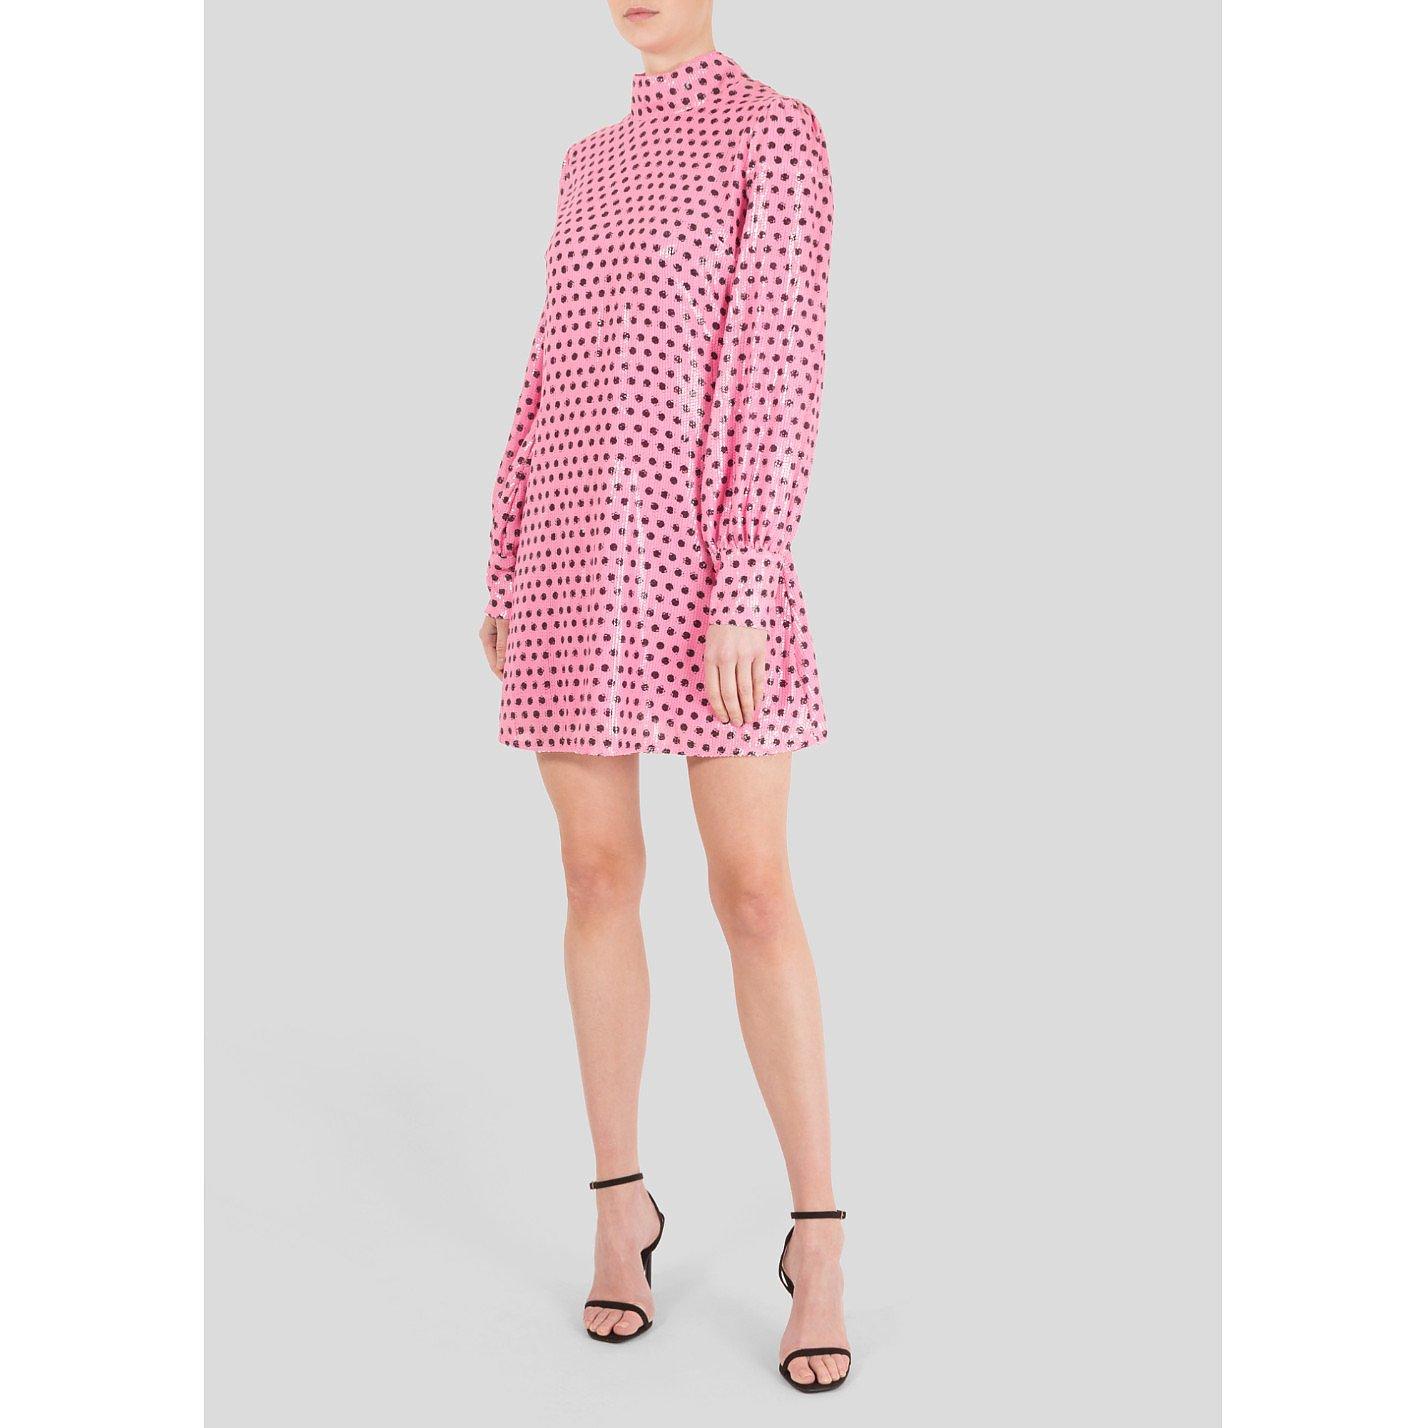 Olivia Rubin Sequin Polka Dot Dress